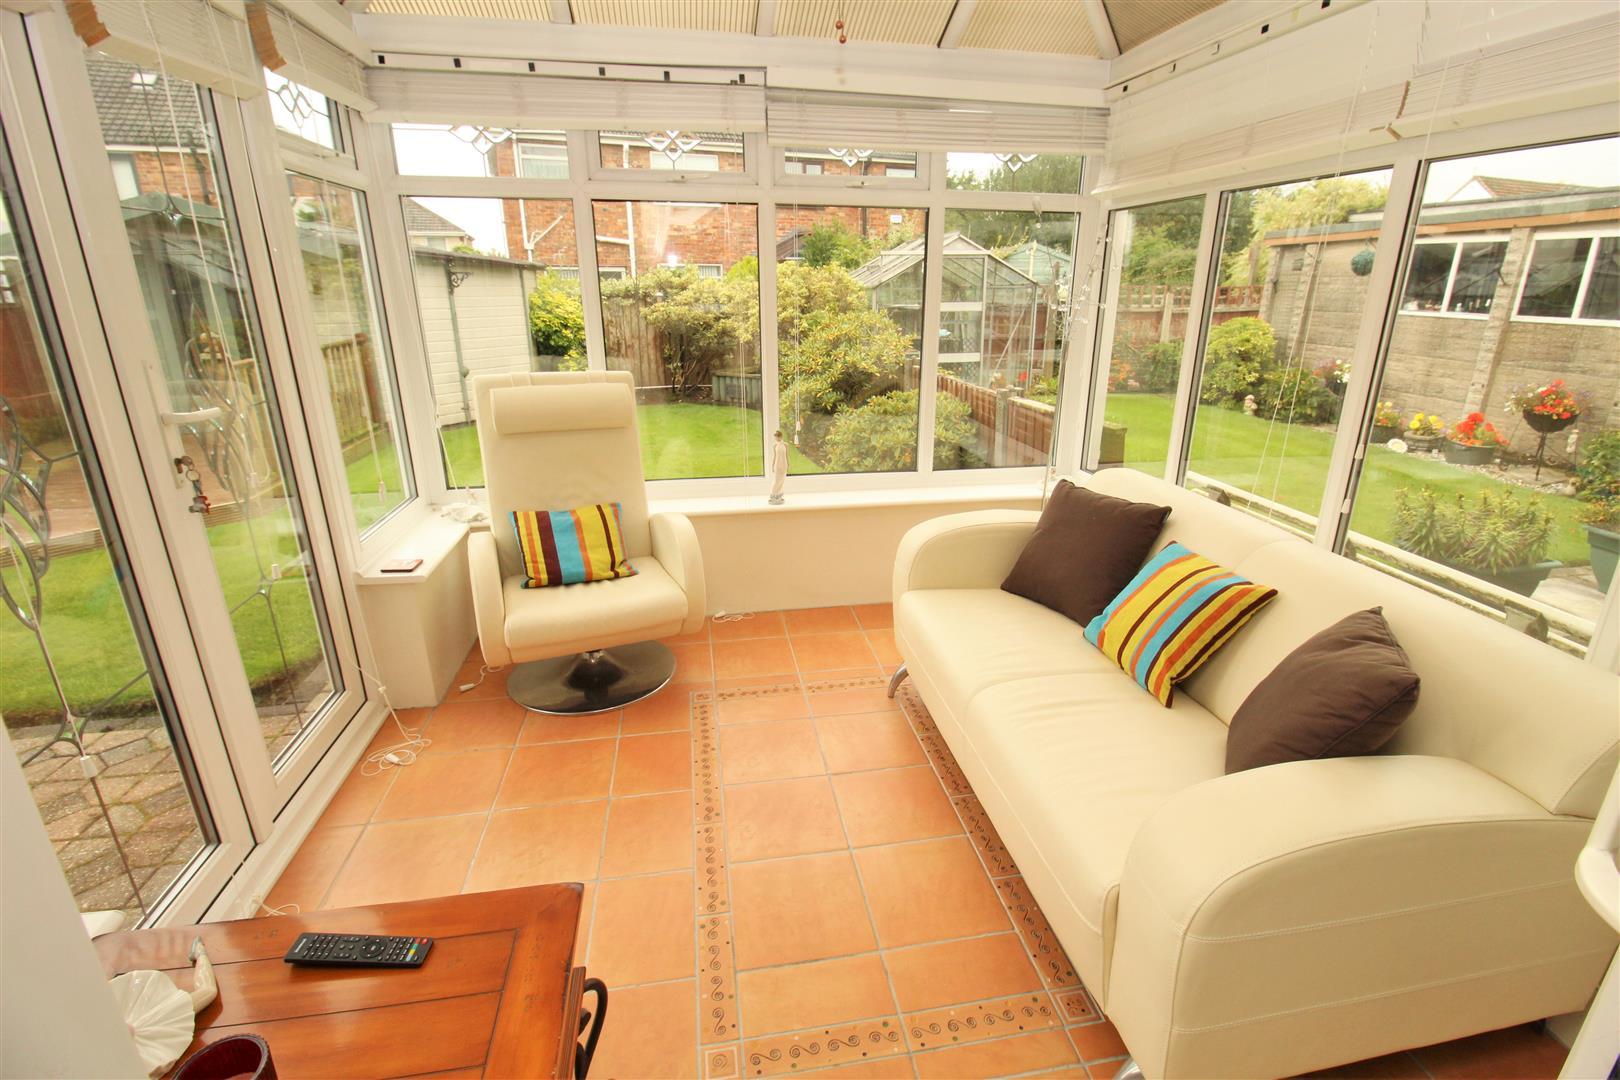 3 Bedrooms, House - Semi-Detached, Dunlop Drive, Melling, Liverpool